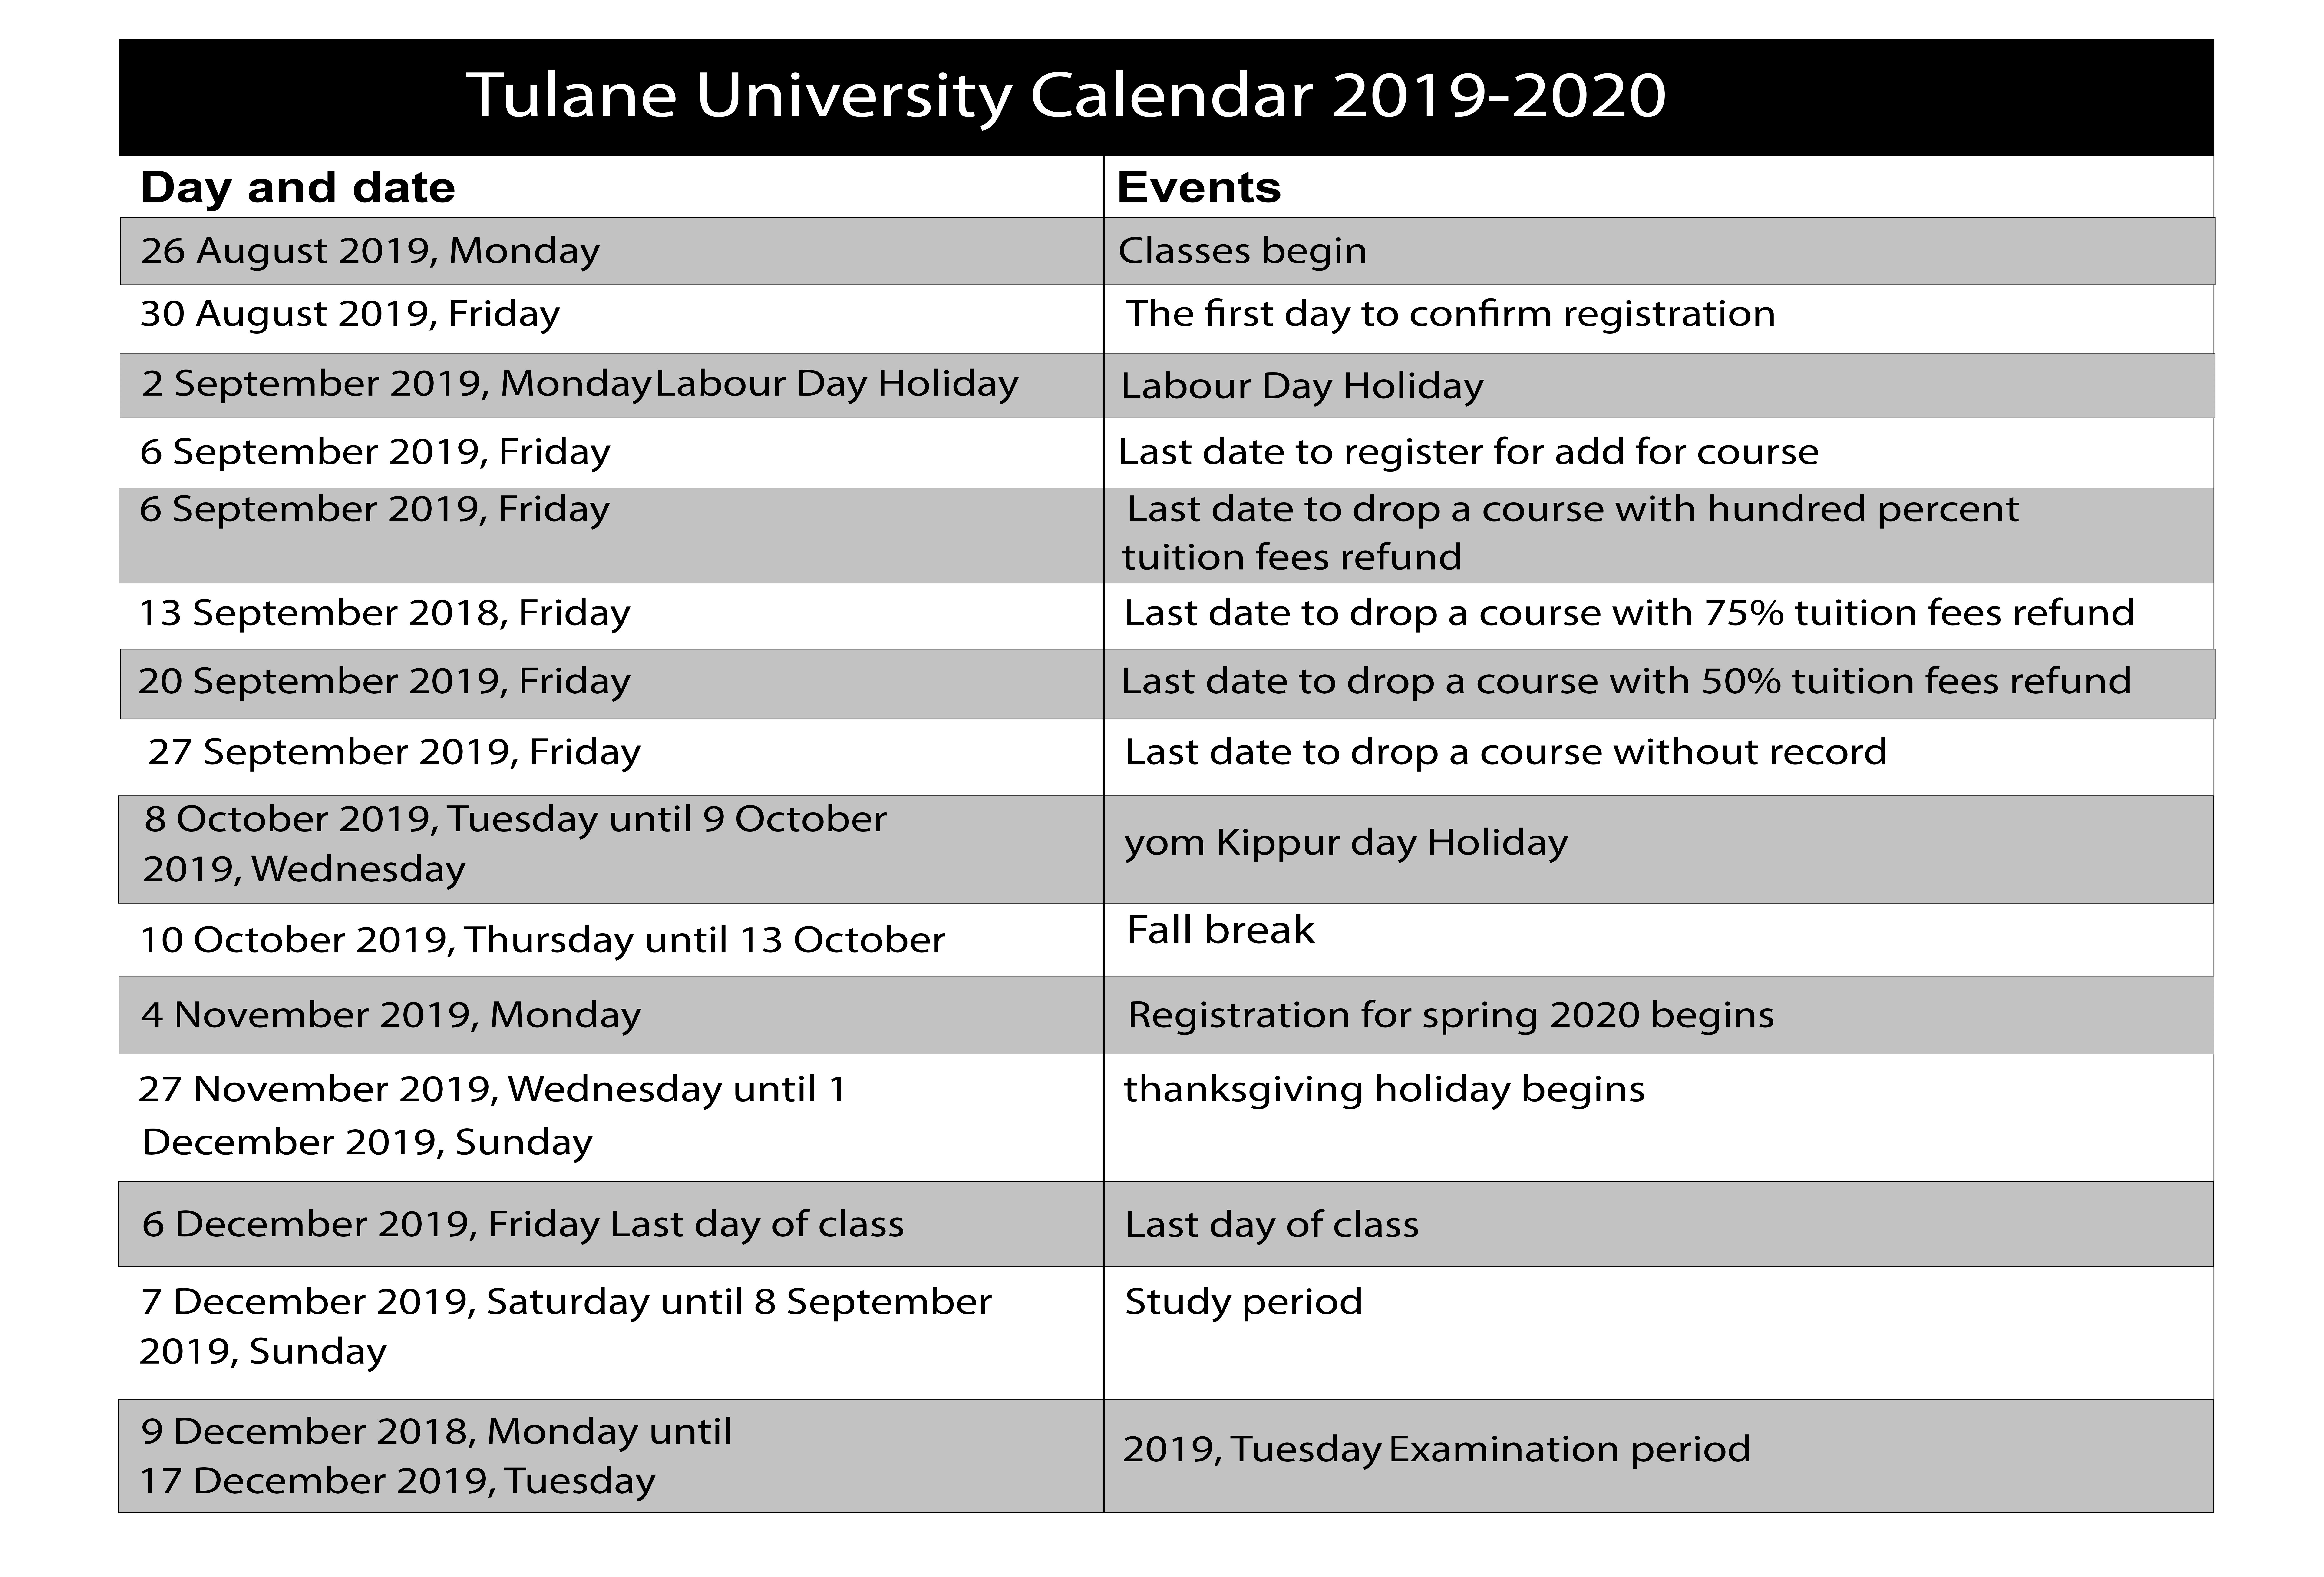 Tulane University calendar